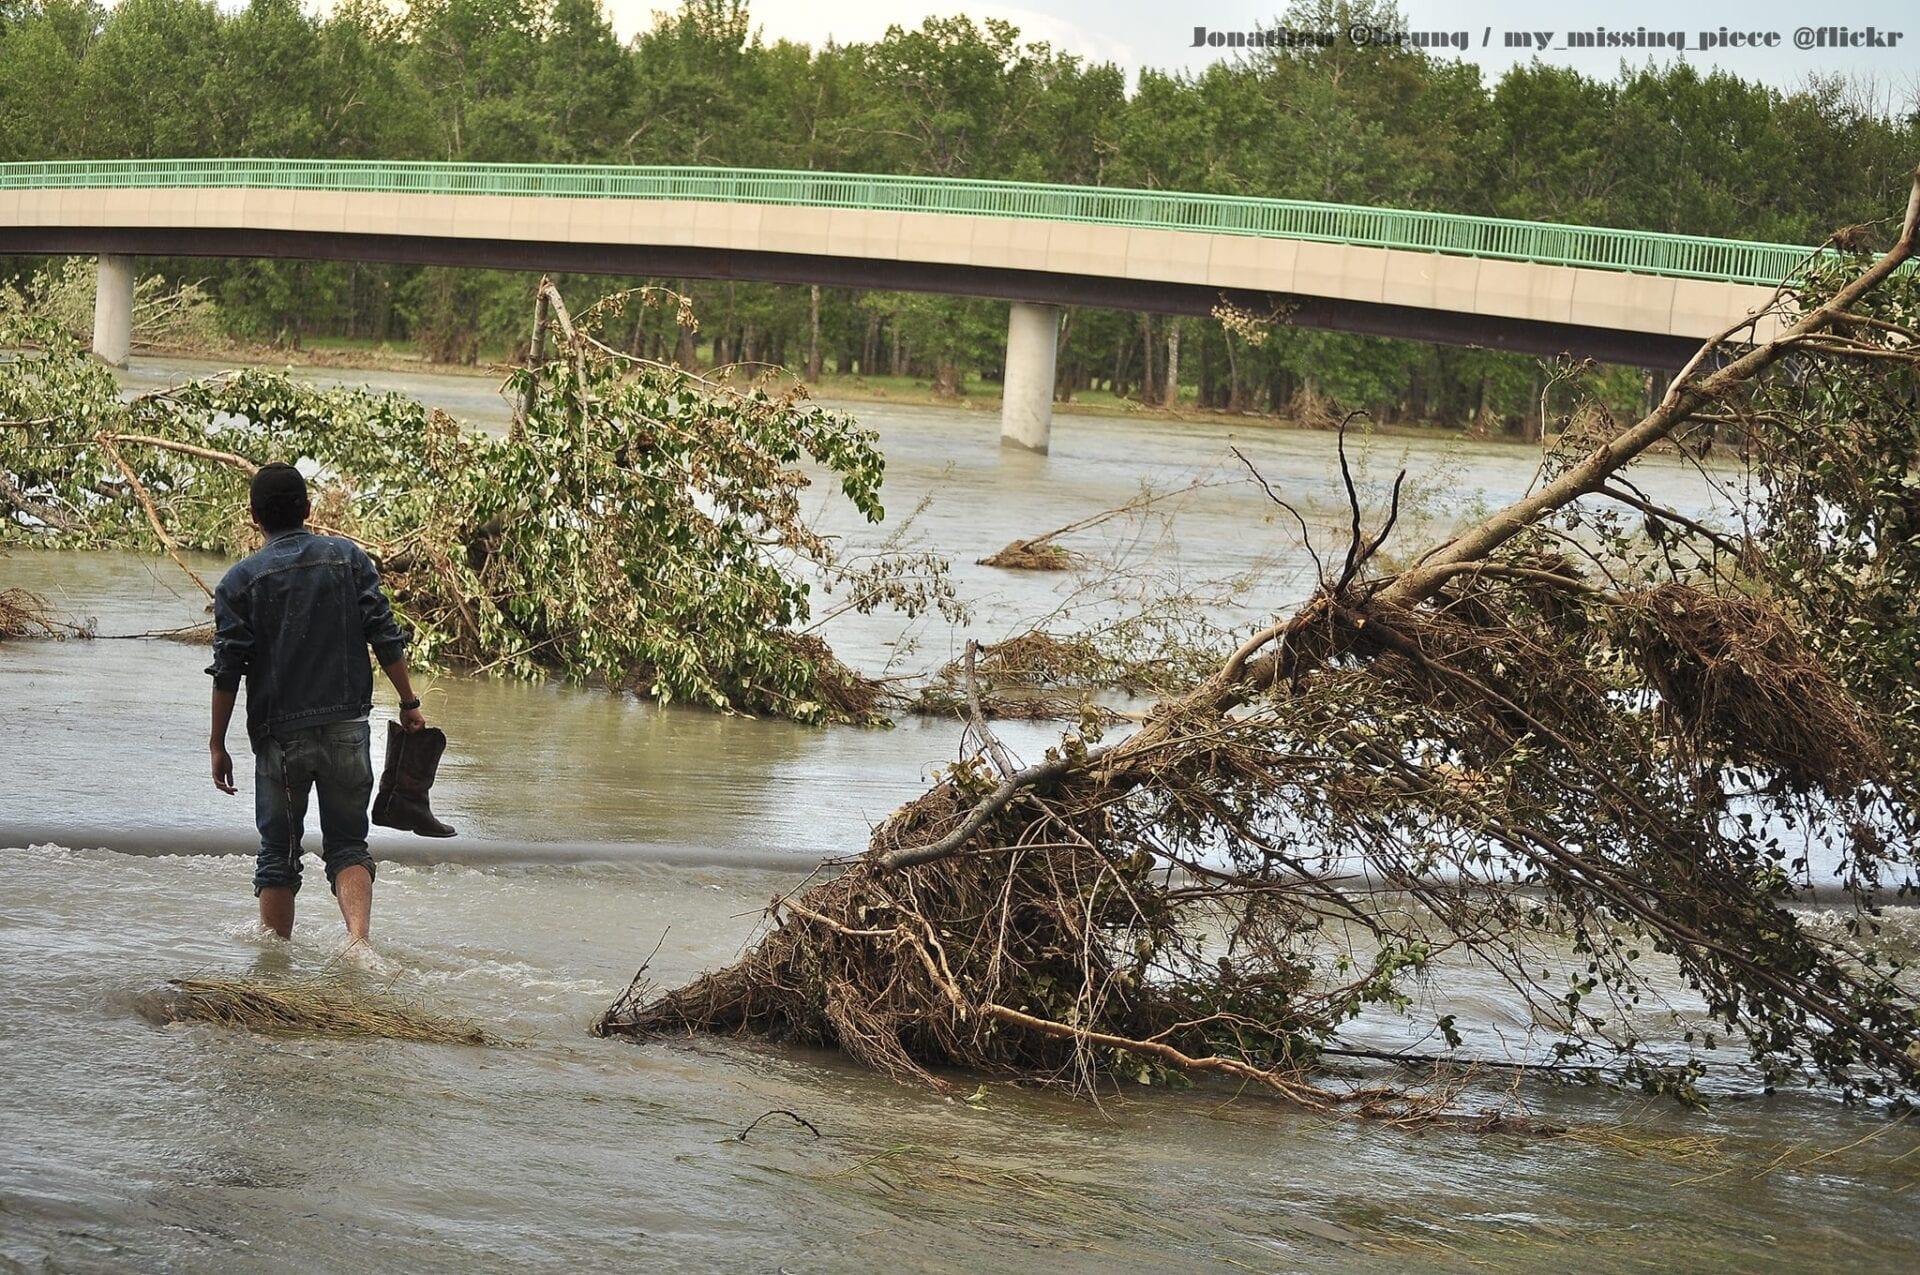 calgary-flood fishcreek- fish creek (2)